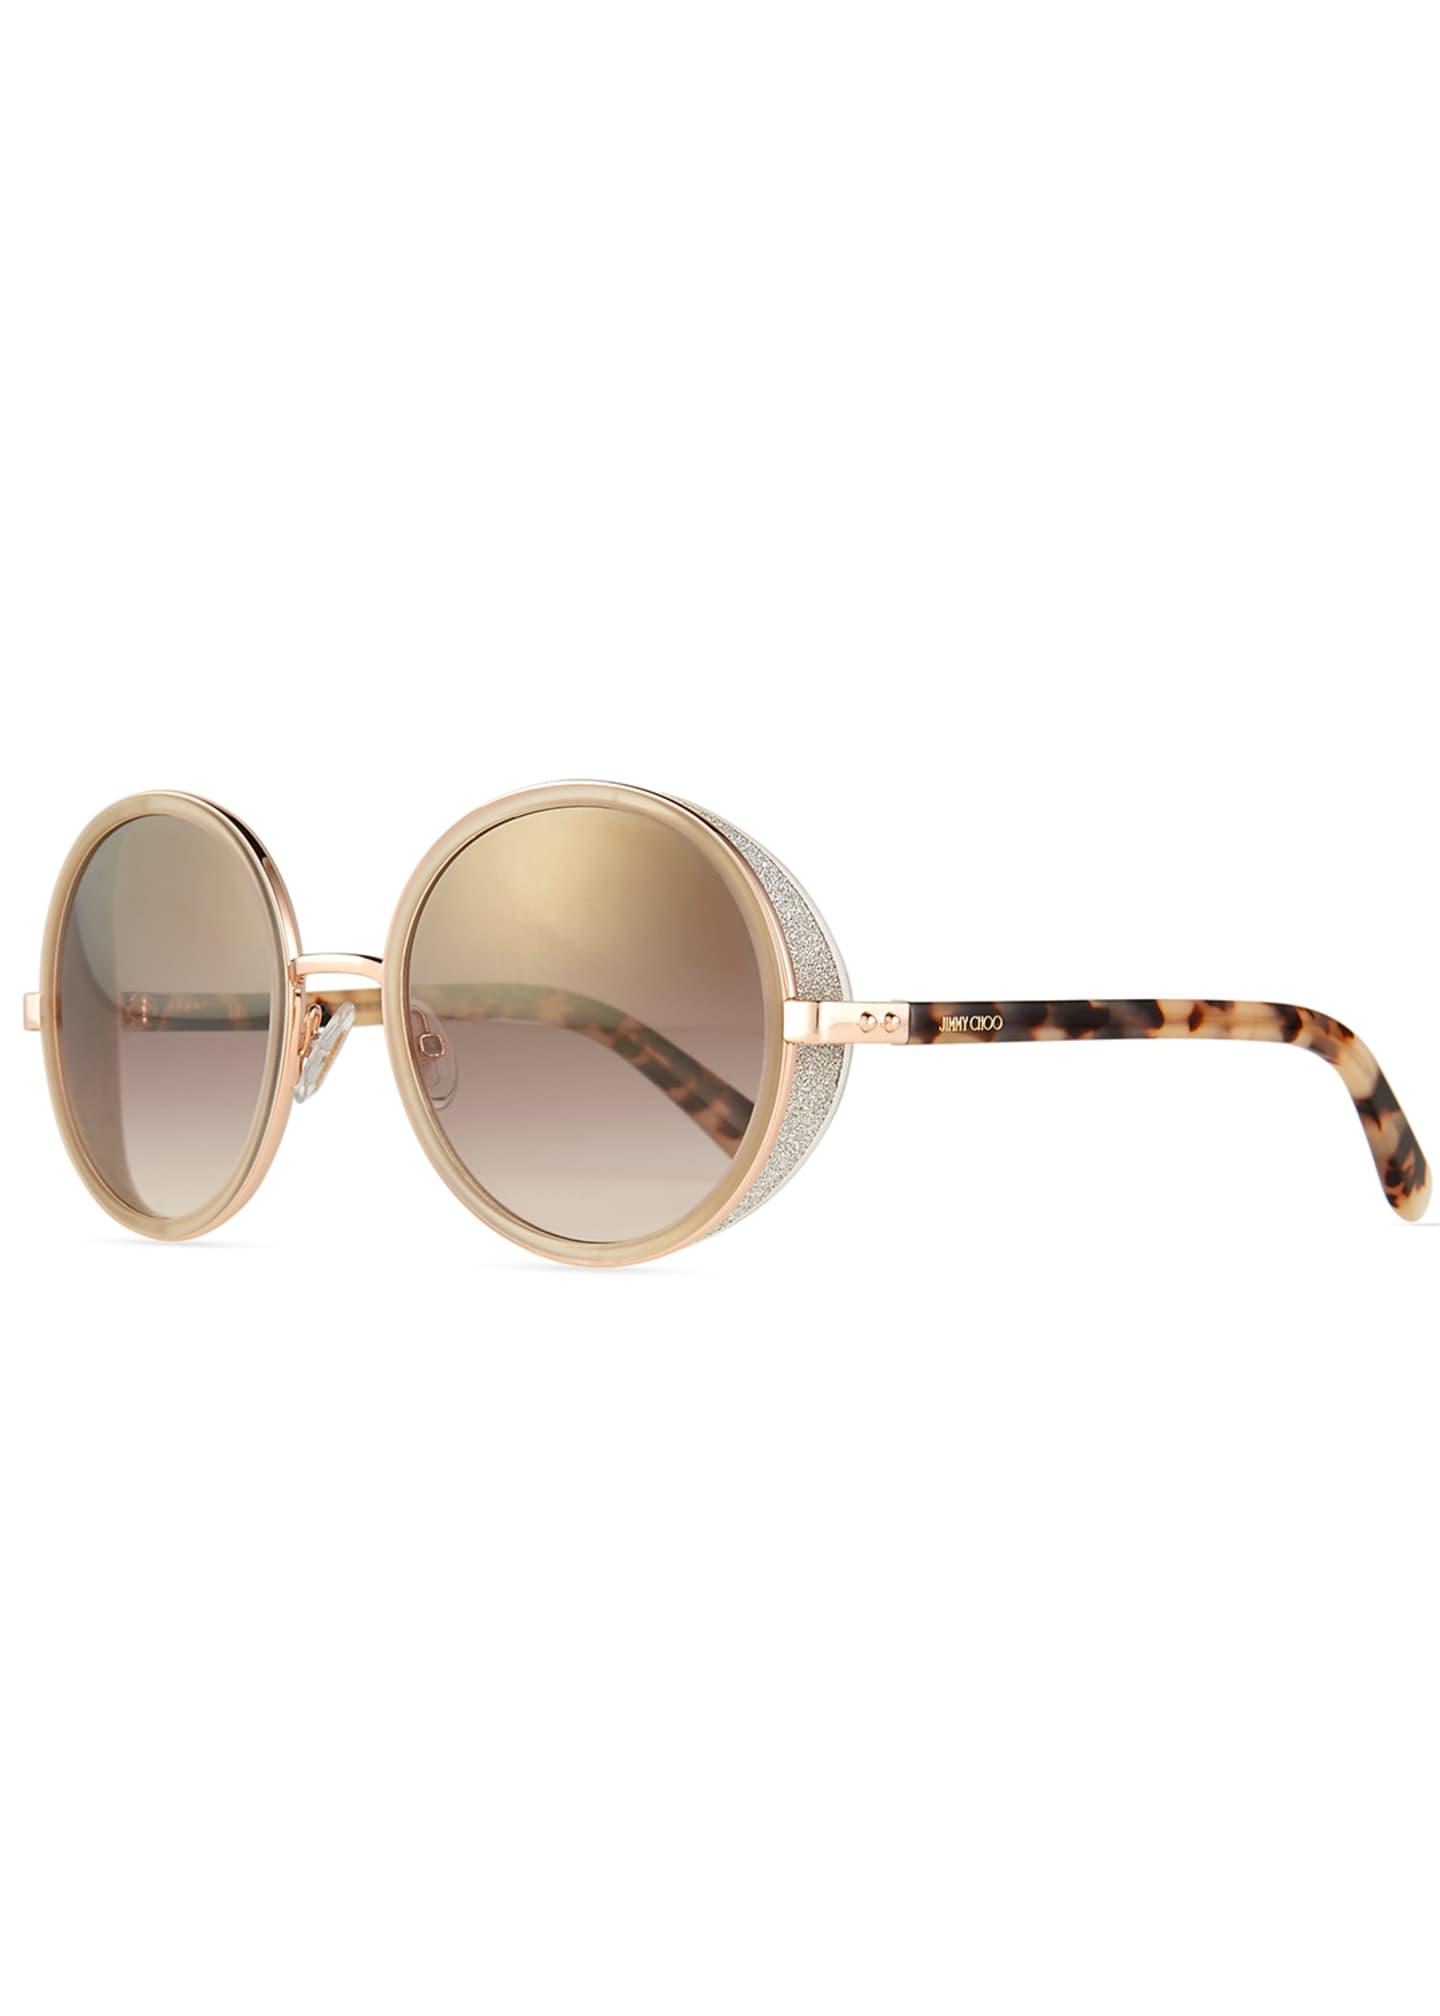 Jimmy Choo Andie Round Glitter-Trim Sunglasses